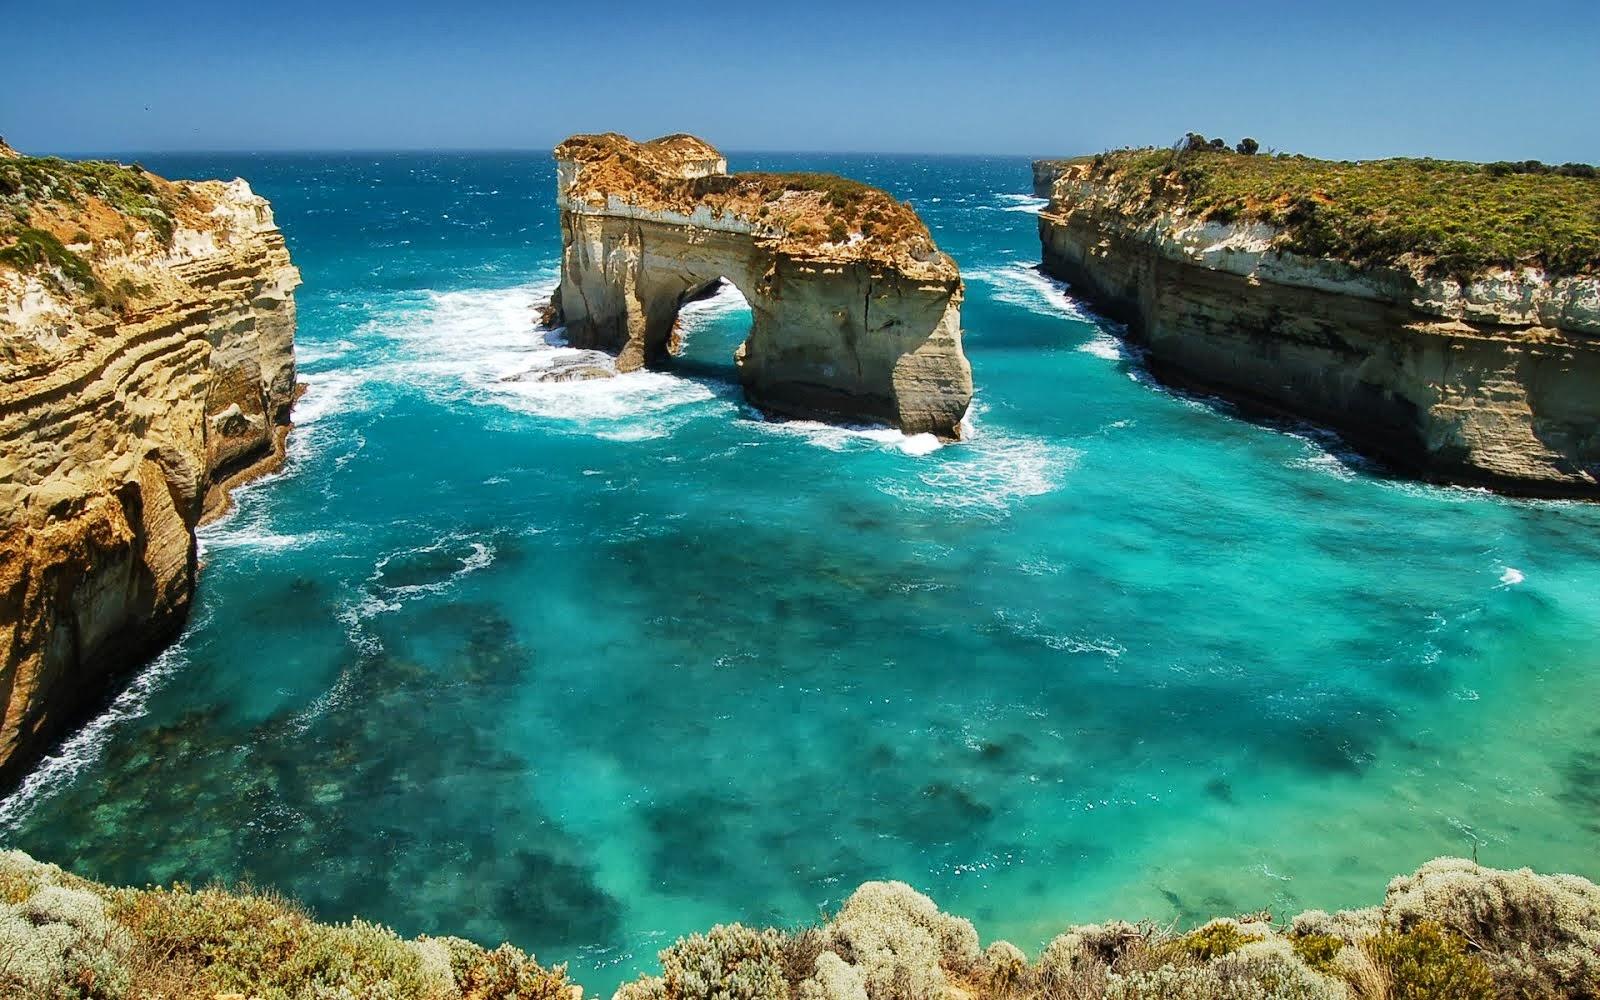 Sea Ocean Blue Beautiful Beach Scene Photos Heavy Wallpaper With 1600x1000